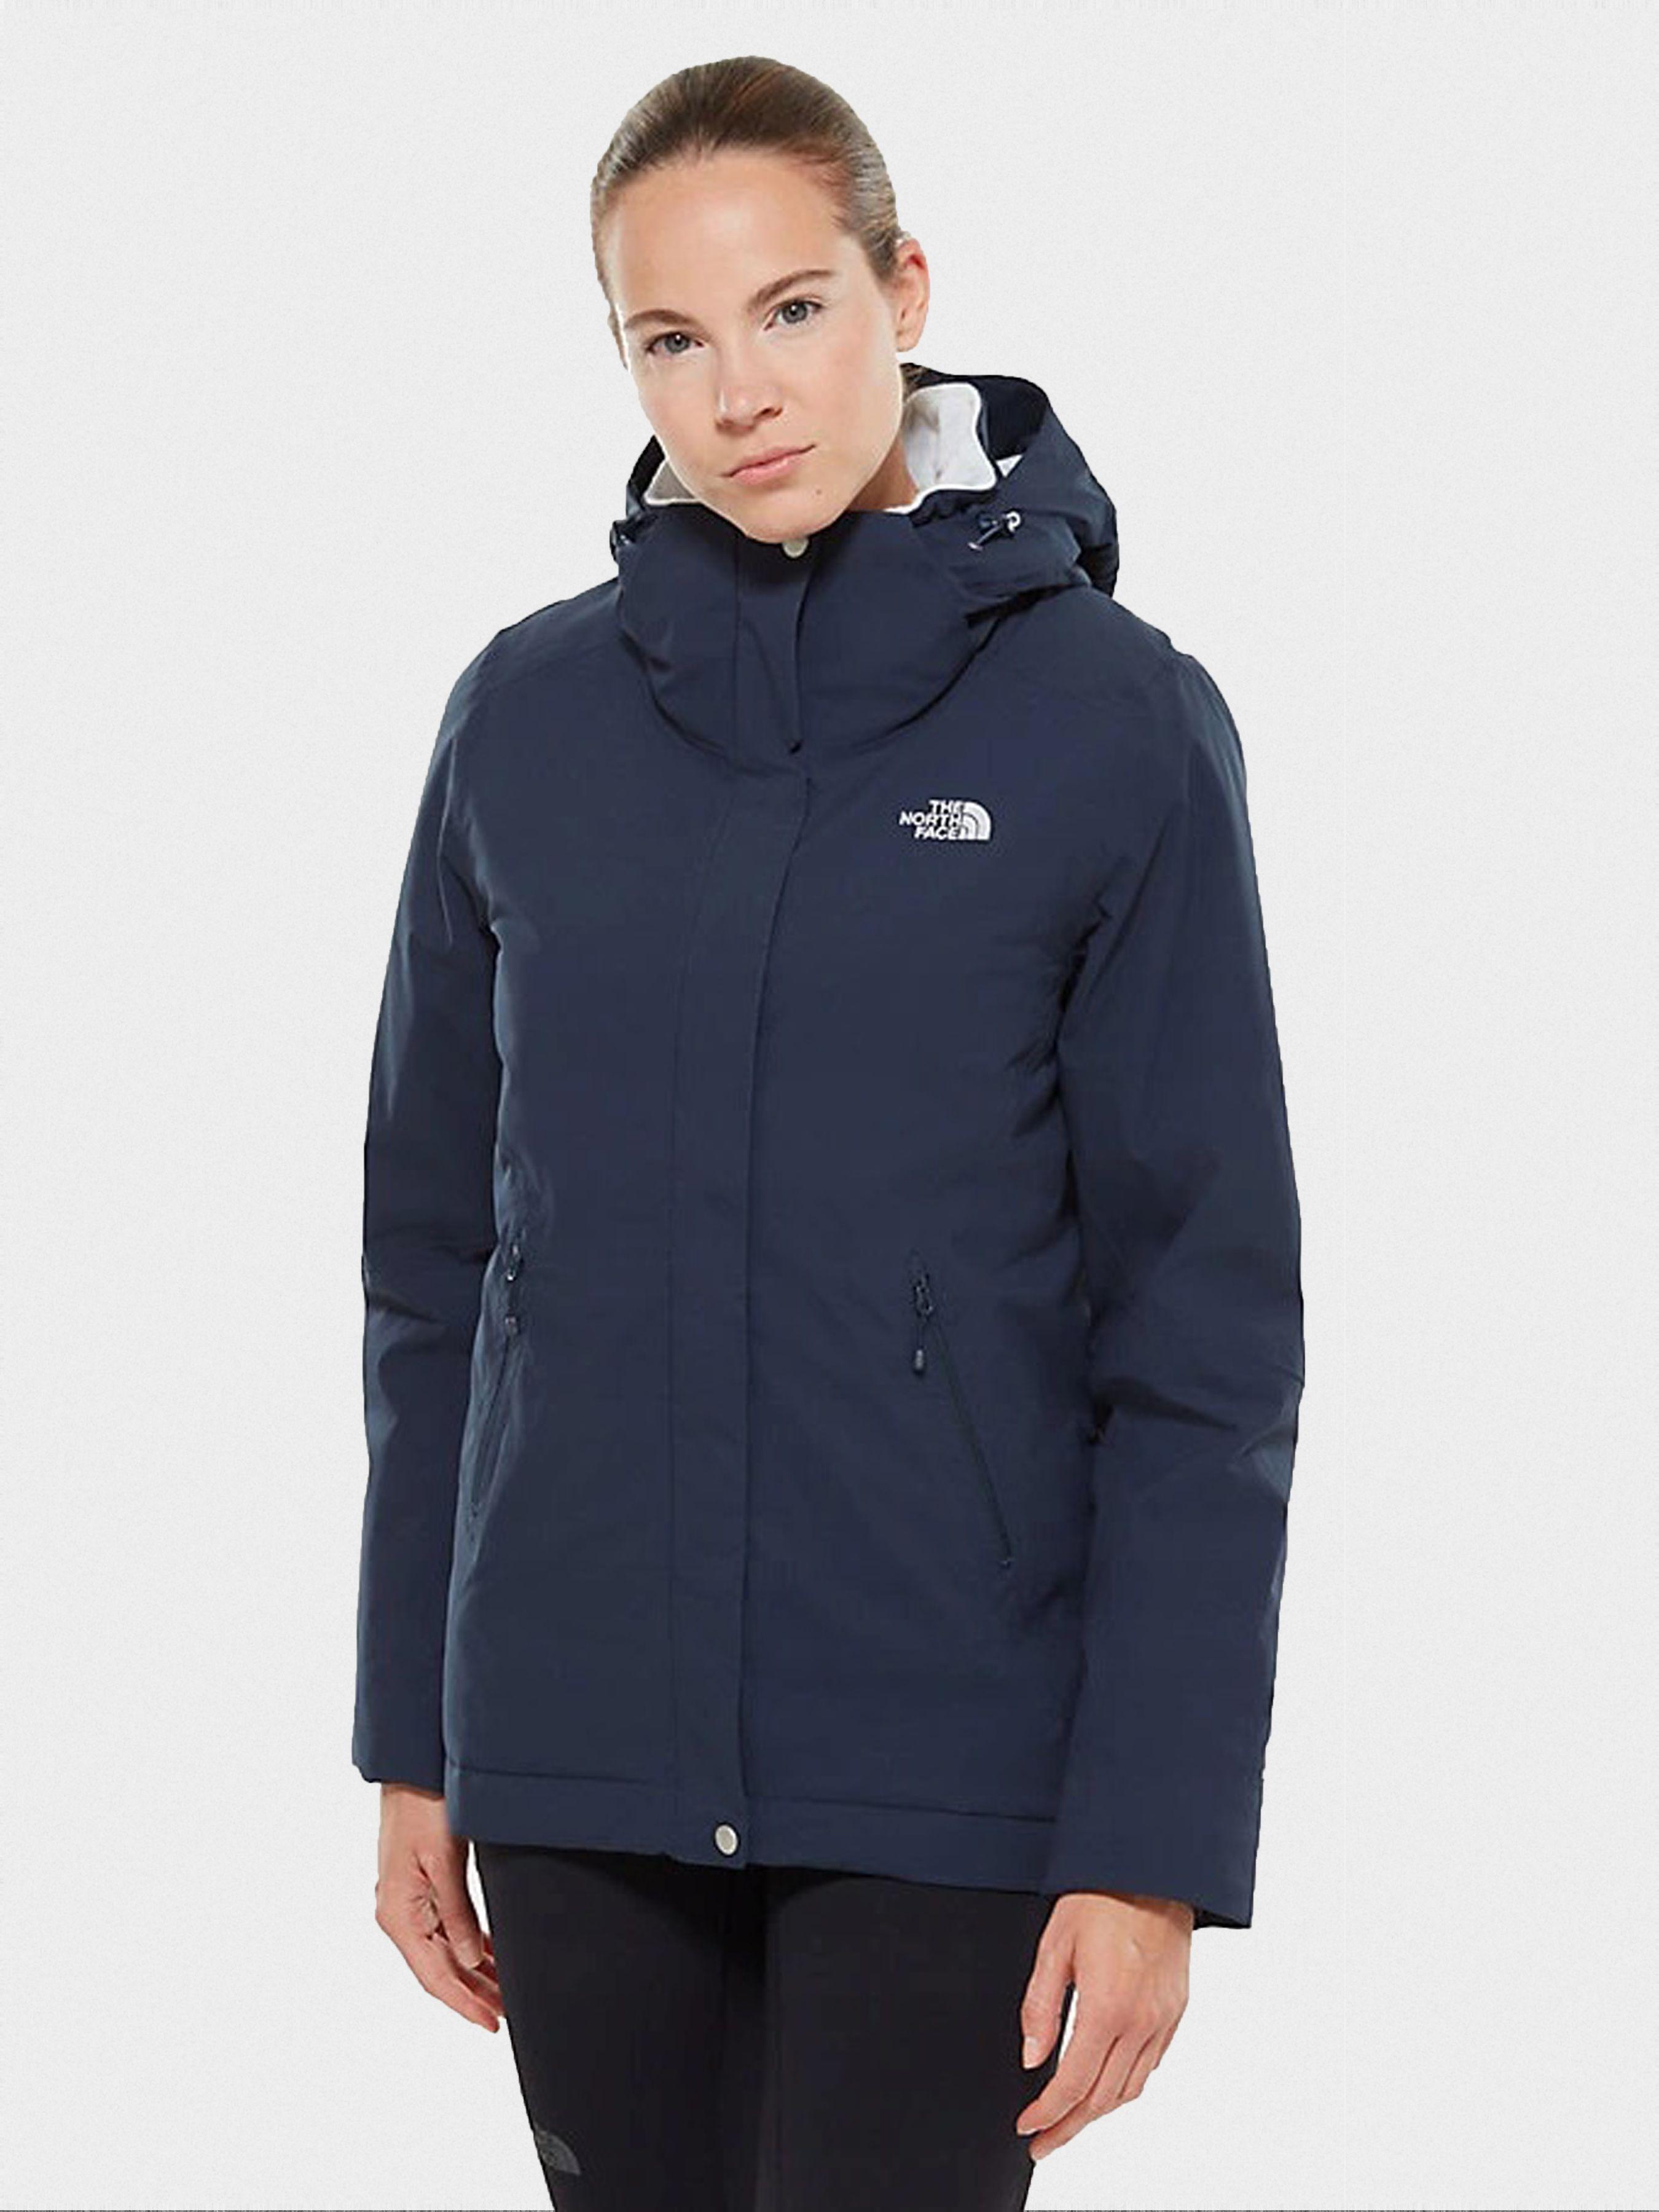 Куртка женские The North Face модель N136 , 2017